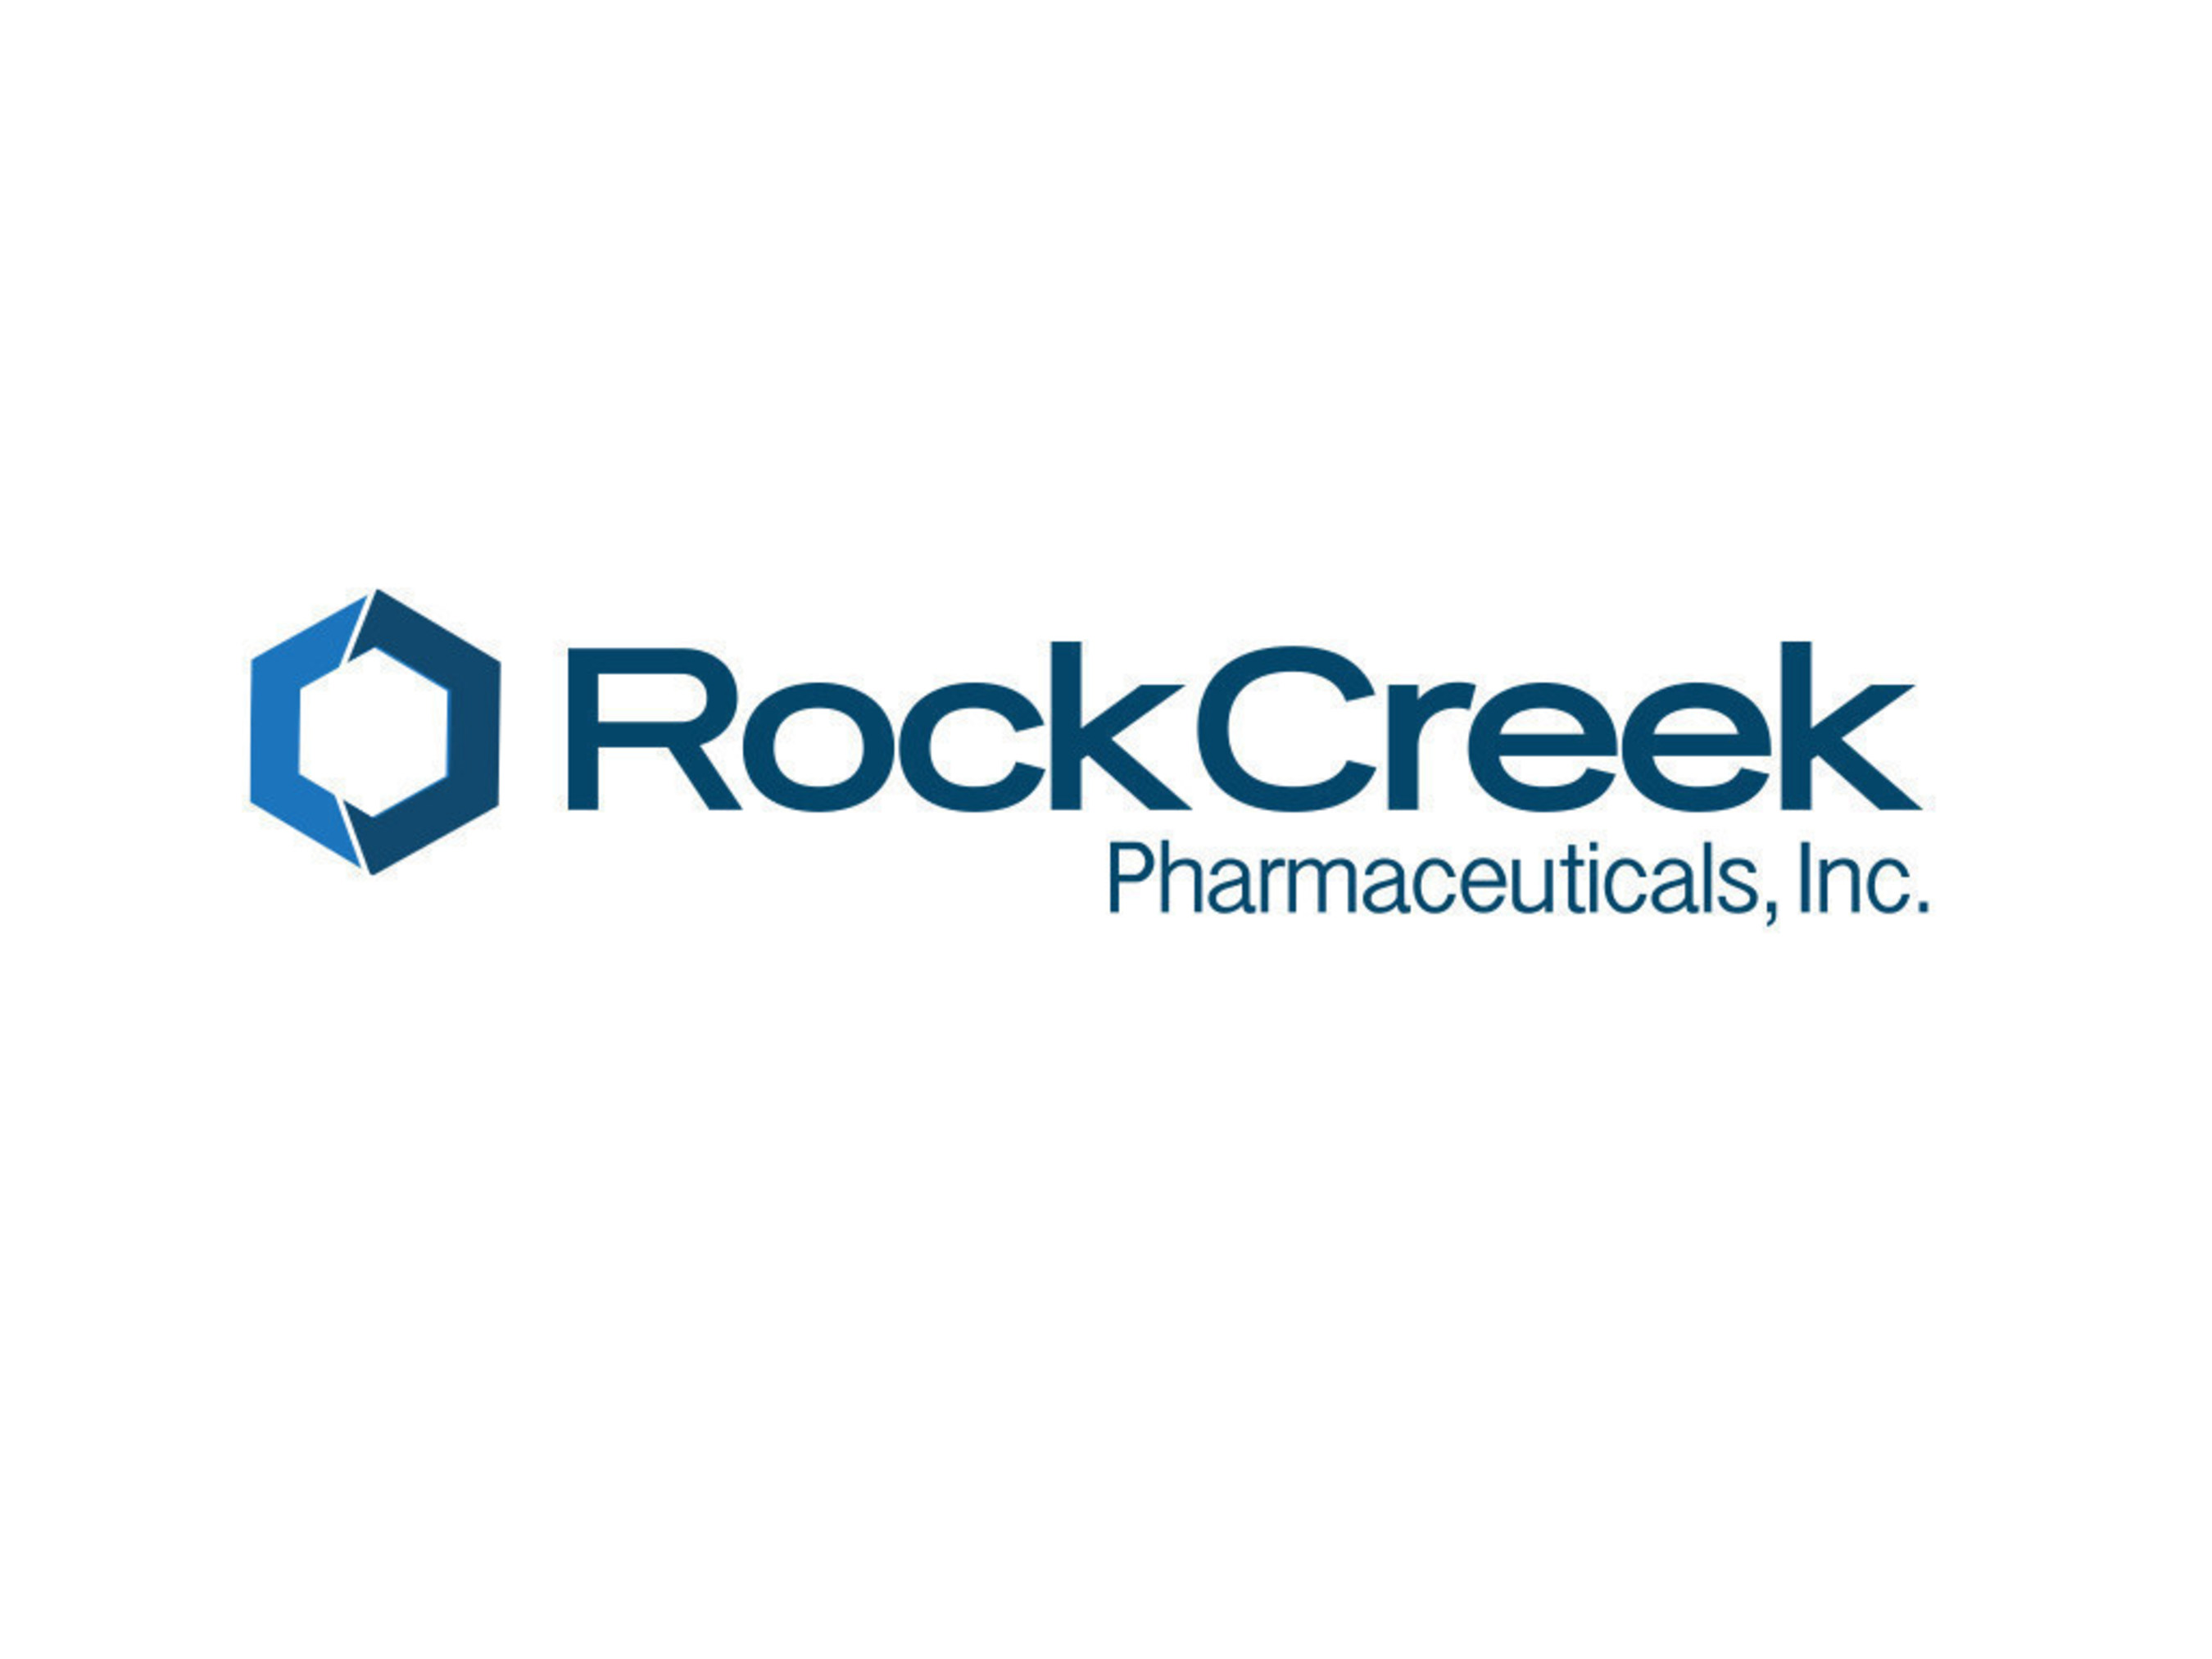 Rock Creek Pharmaceuticals